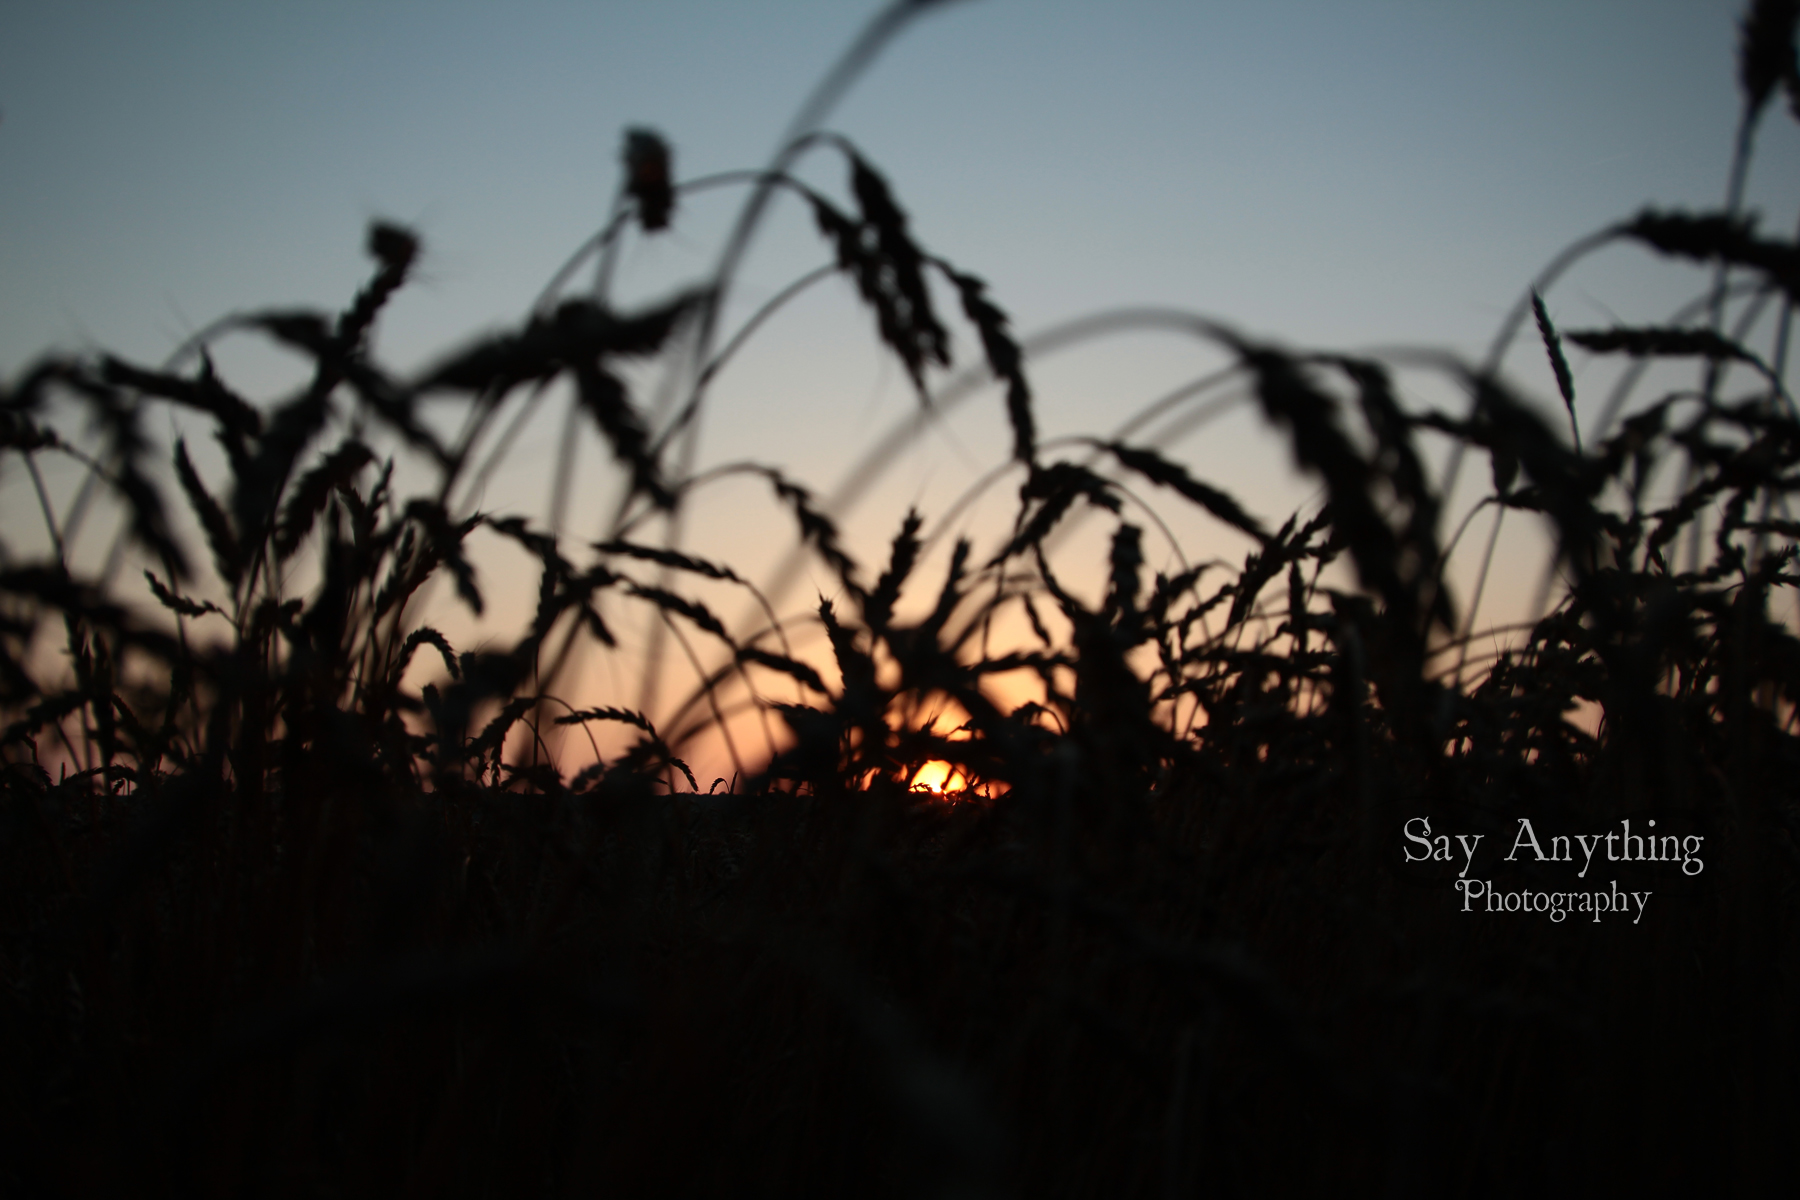 Say Anything Photography WM190.jpg